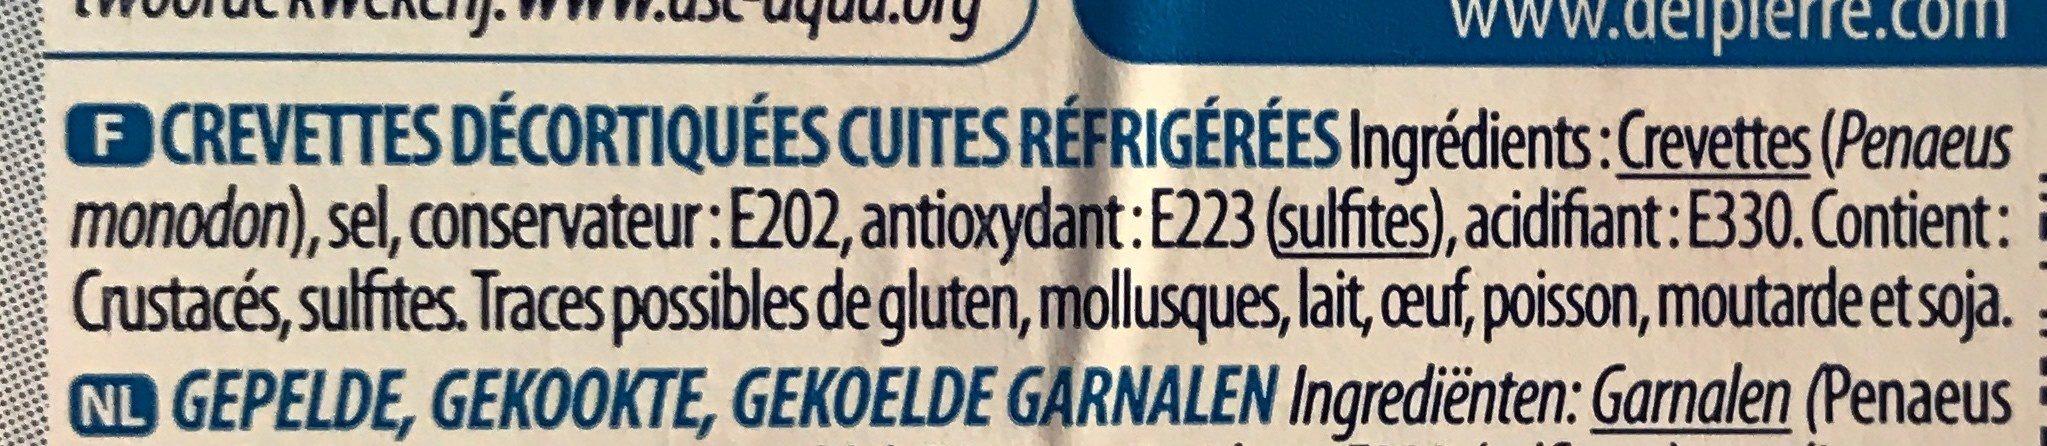 Crevettes décortiquées Madagascar - Ingrediënten - fr